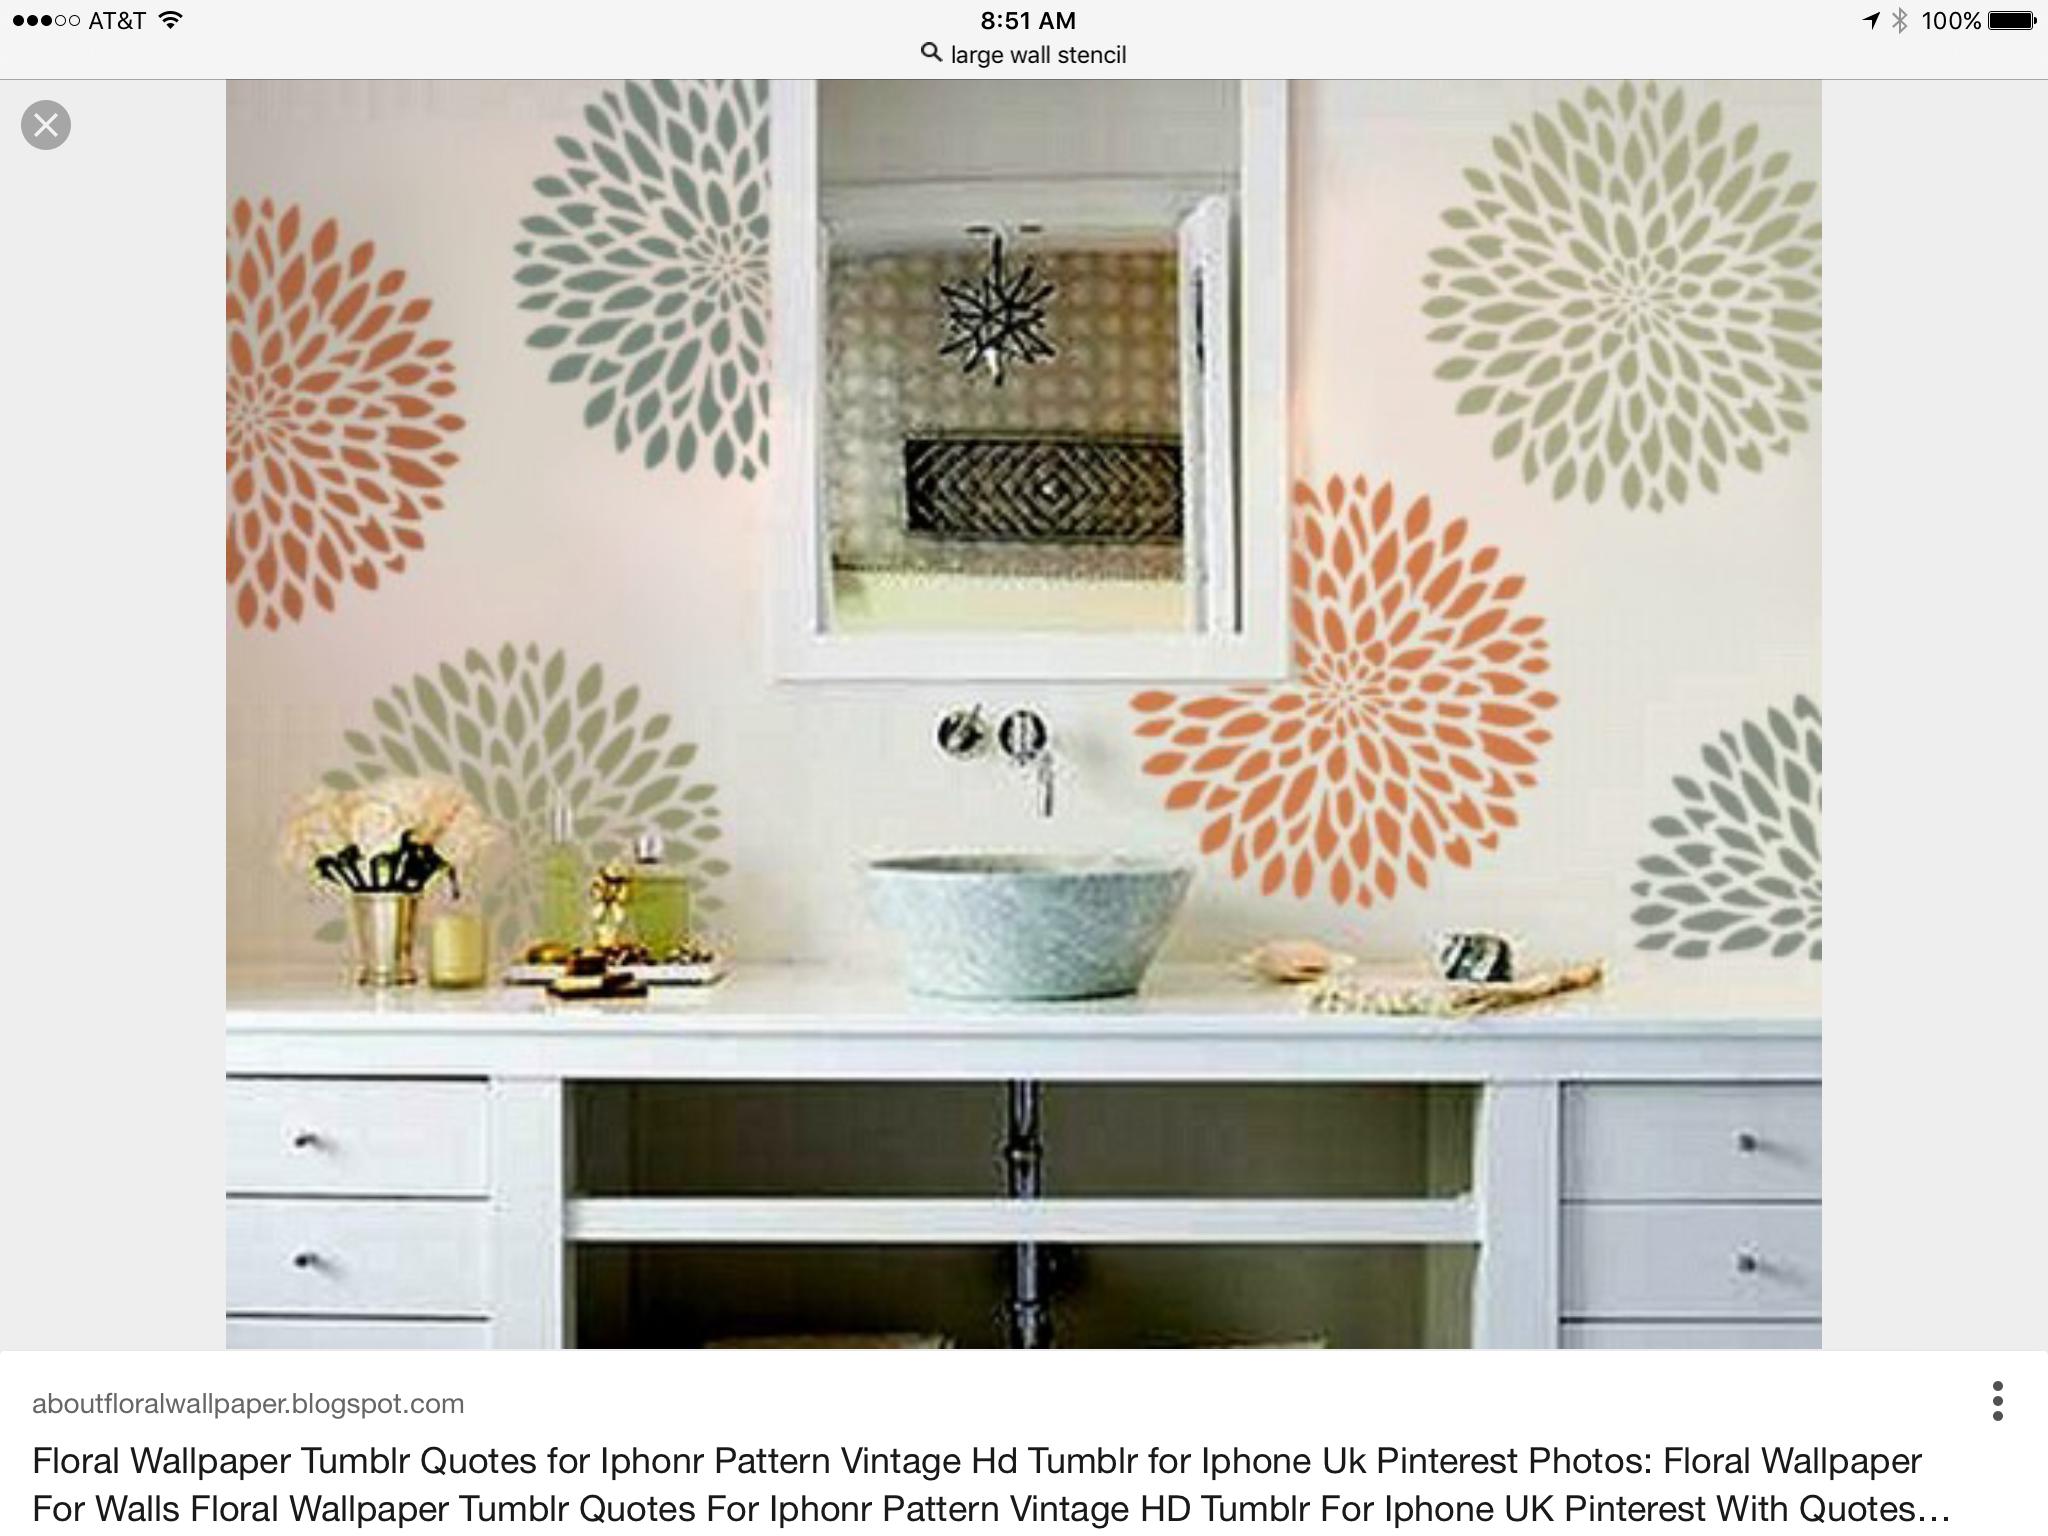 Pin by Cindy Jaeger on Stencils/Wallpaper   Pinterest